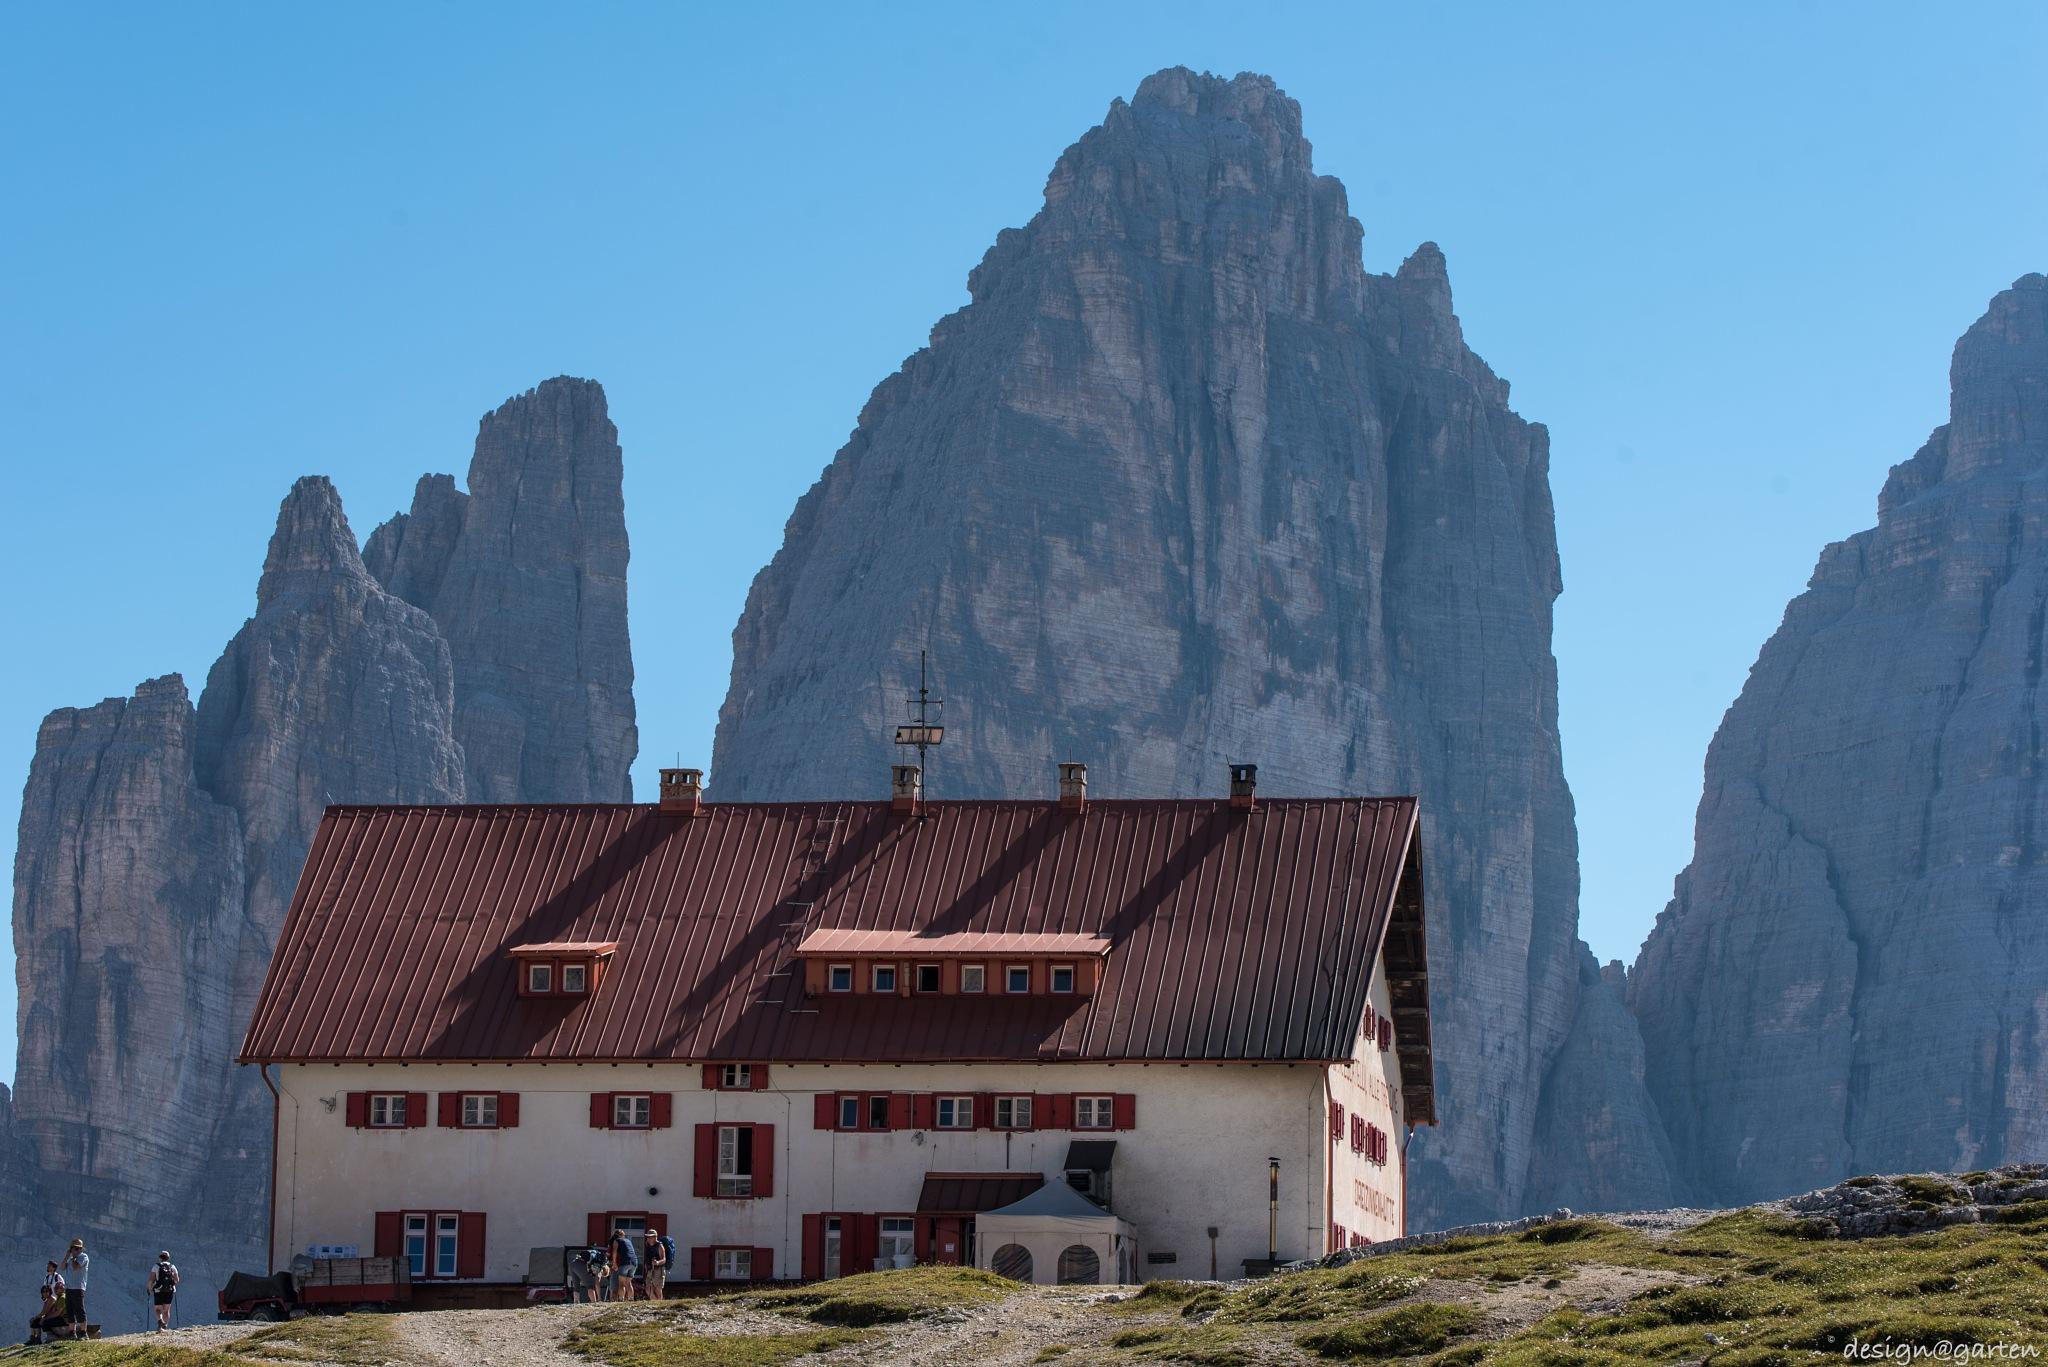 Drei Zinnen Hütte, Südtirol -  Italy by designgarten